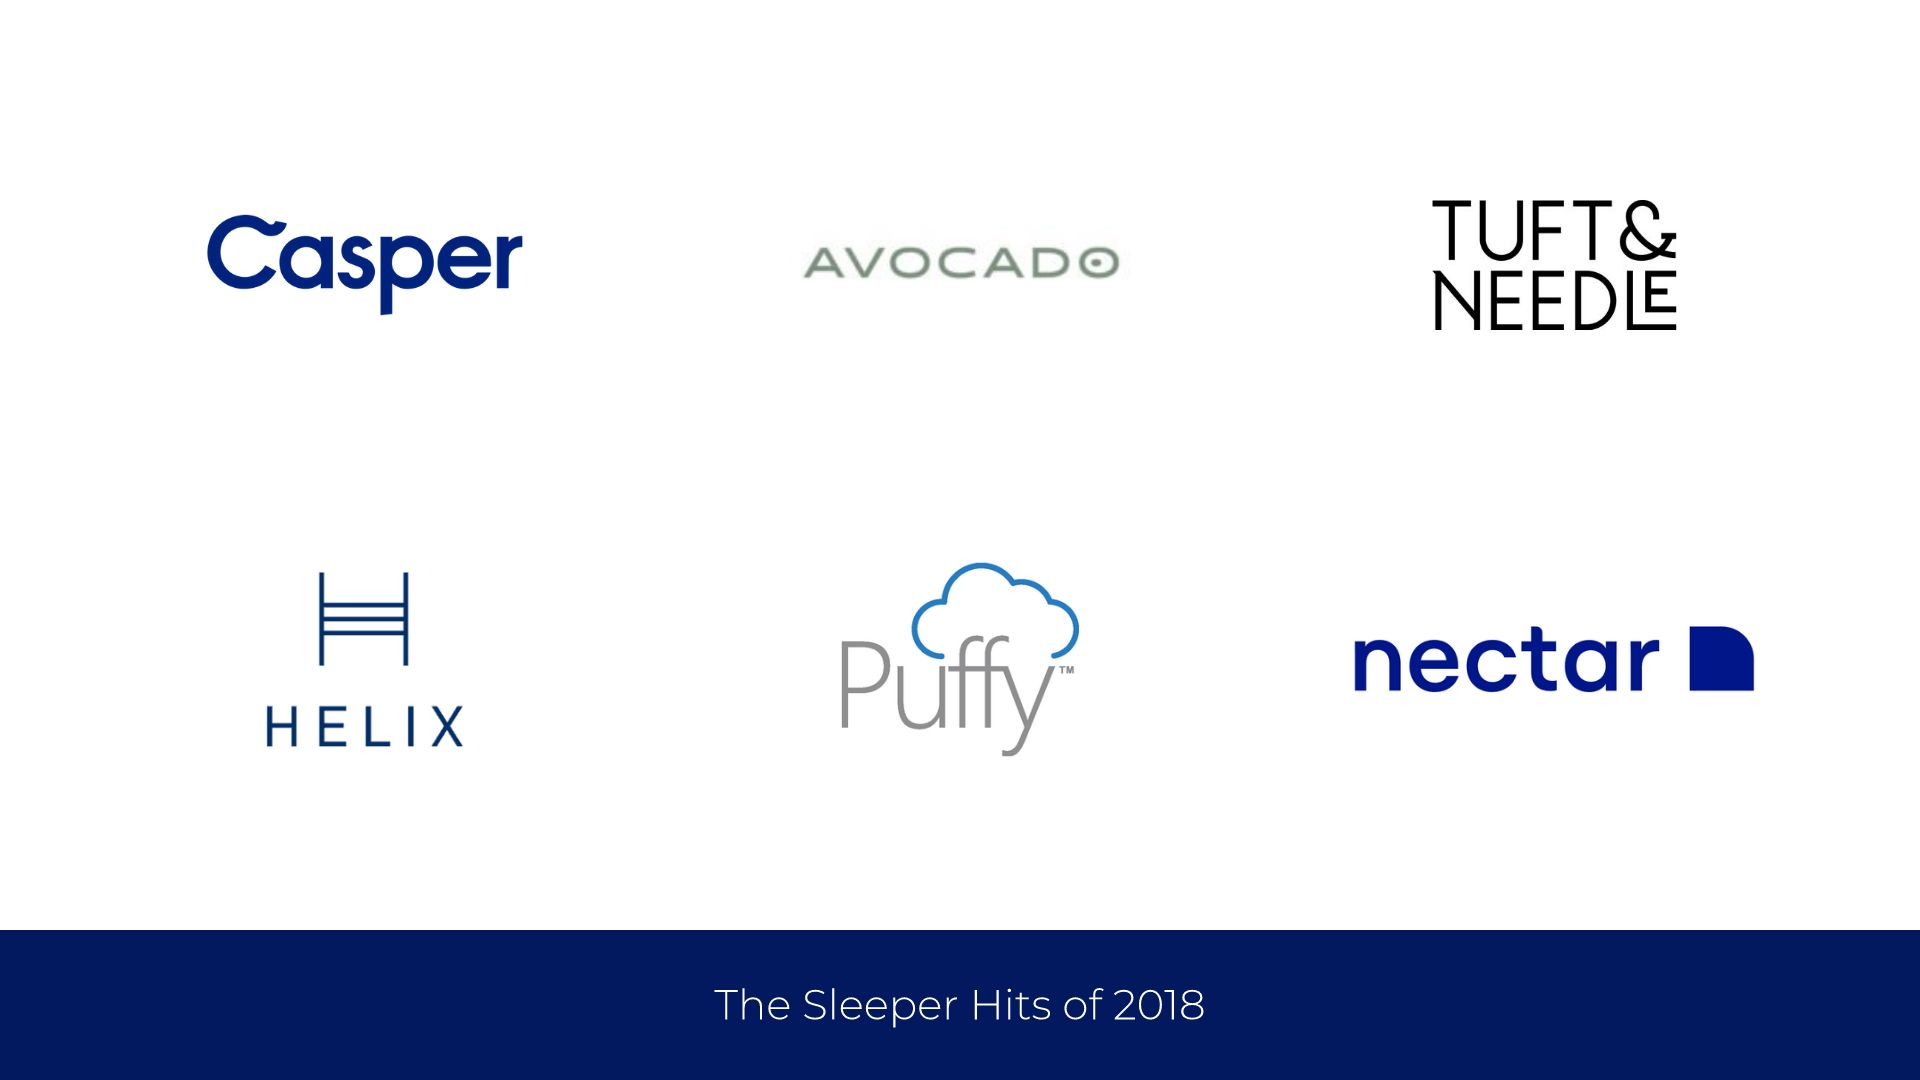 logo grid example showcasing mattress brands